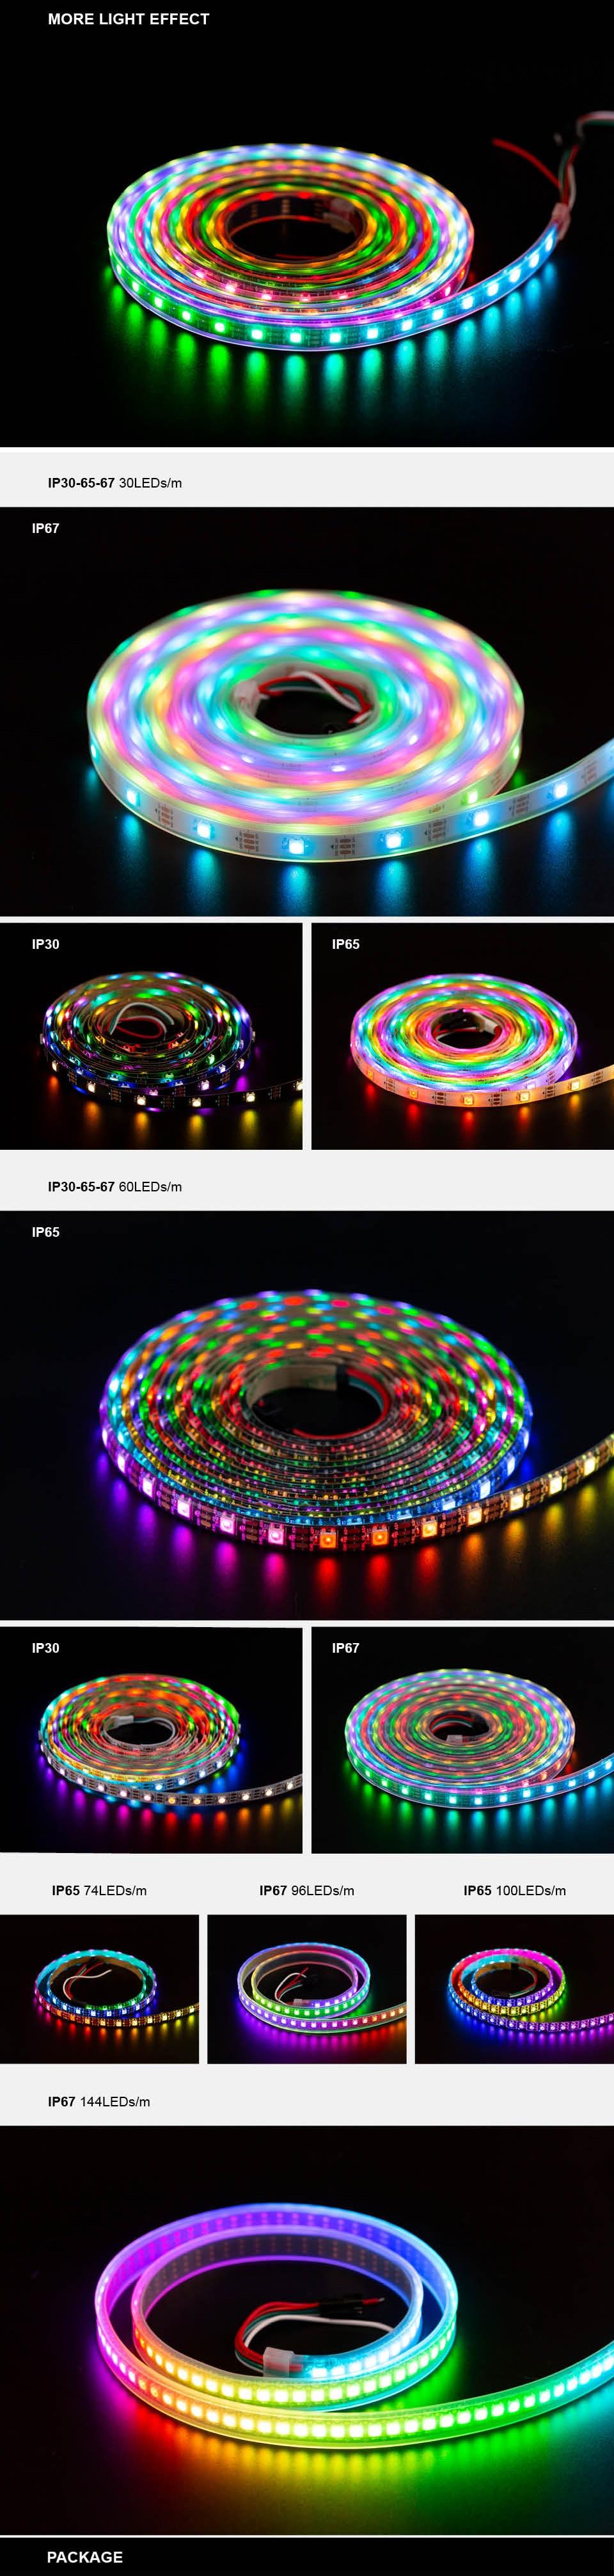 HTB1.1aOXErrK1RkSne1q6ArVVXaK 1m/2m/4m/5m WS2812B Led Strip 30/60/74/96/100/144 pixels/leds/m WS2812 Smart RGB Led Light Strip Black/White PCB IP30/65/67 DC5V